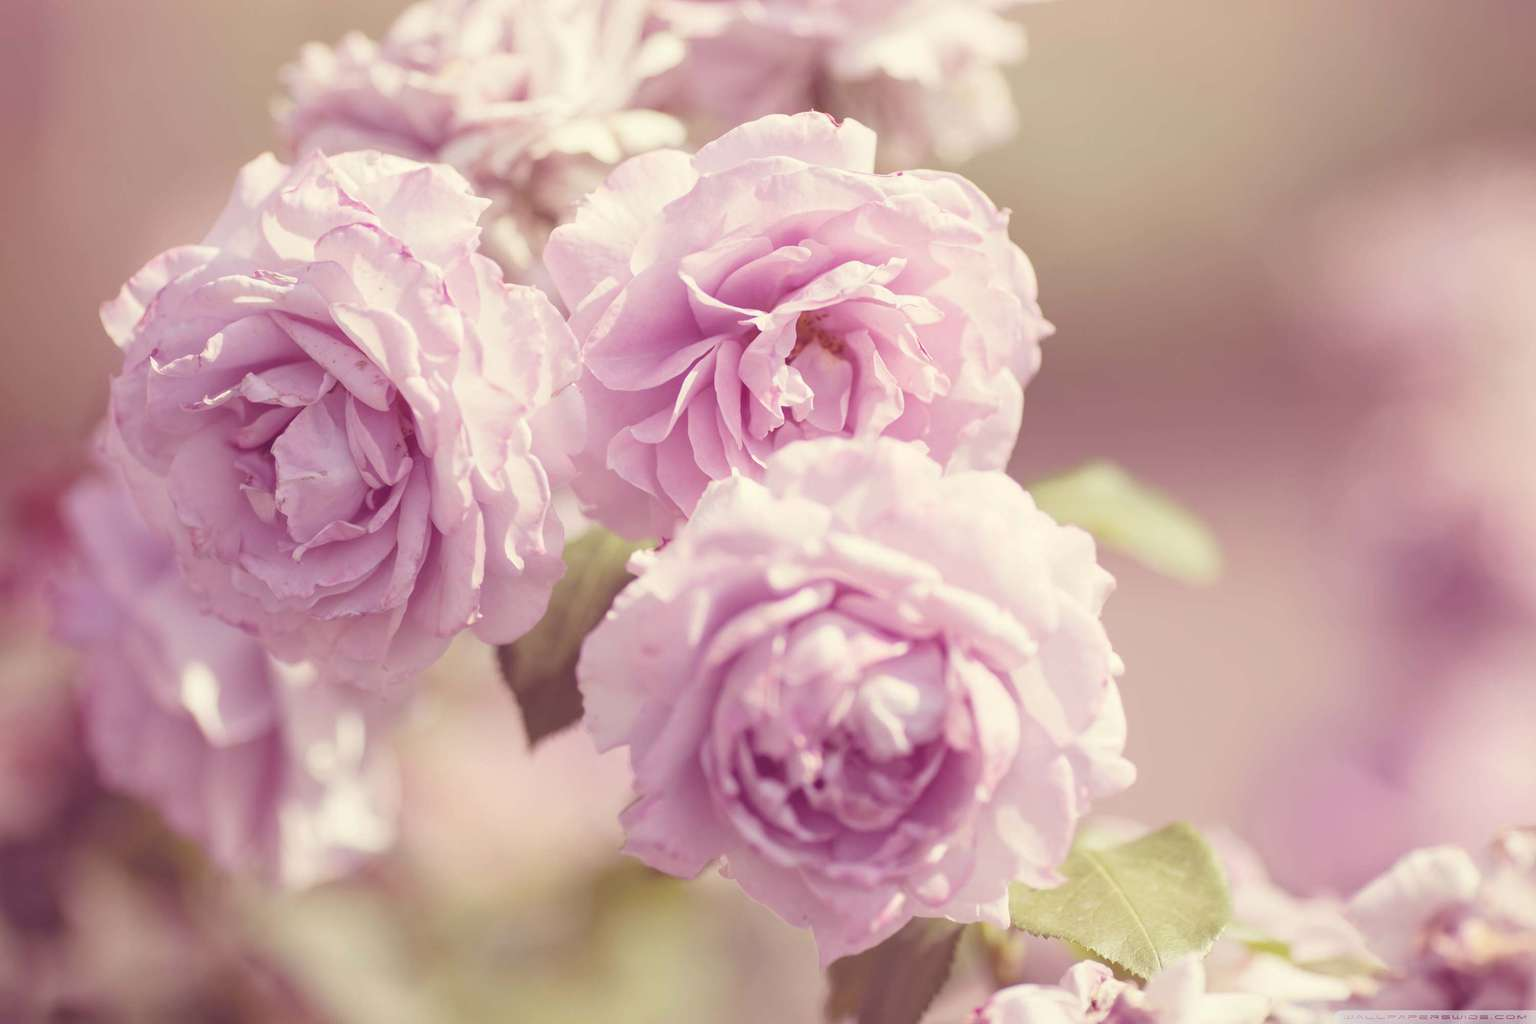 pink_roses_vintage-wallpaper-lovesove